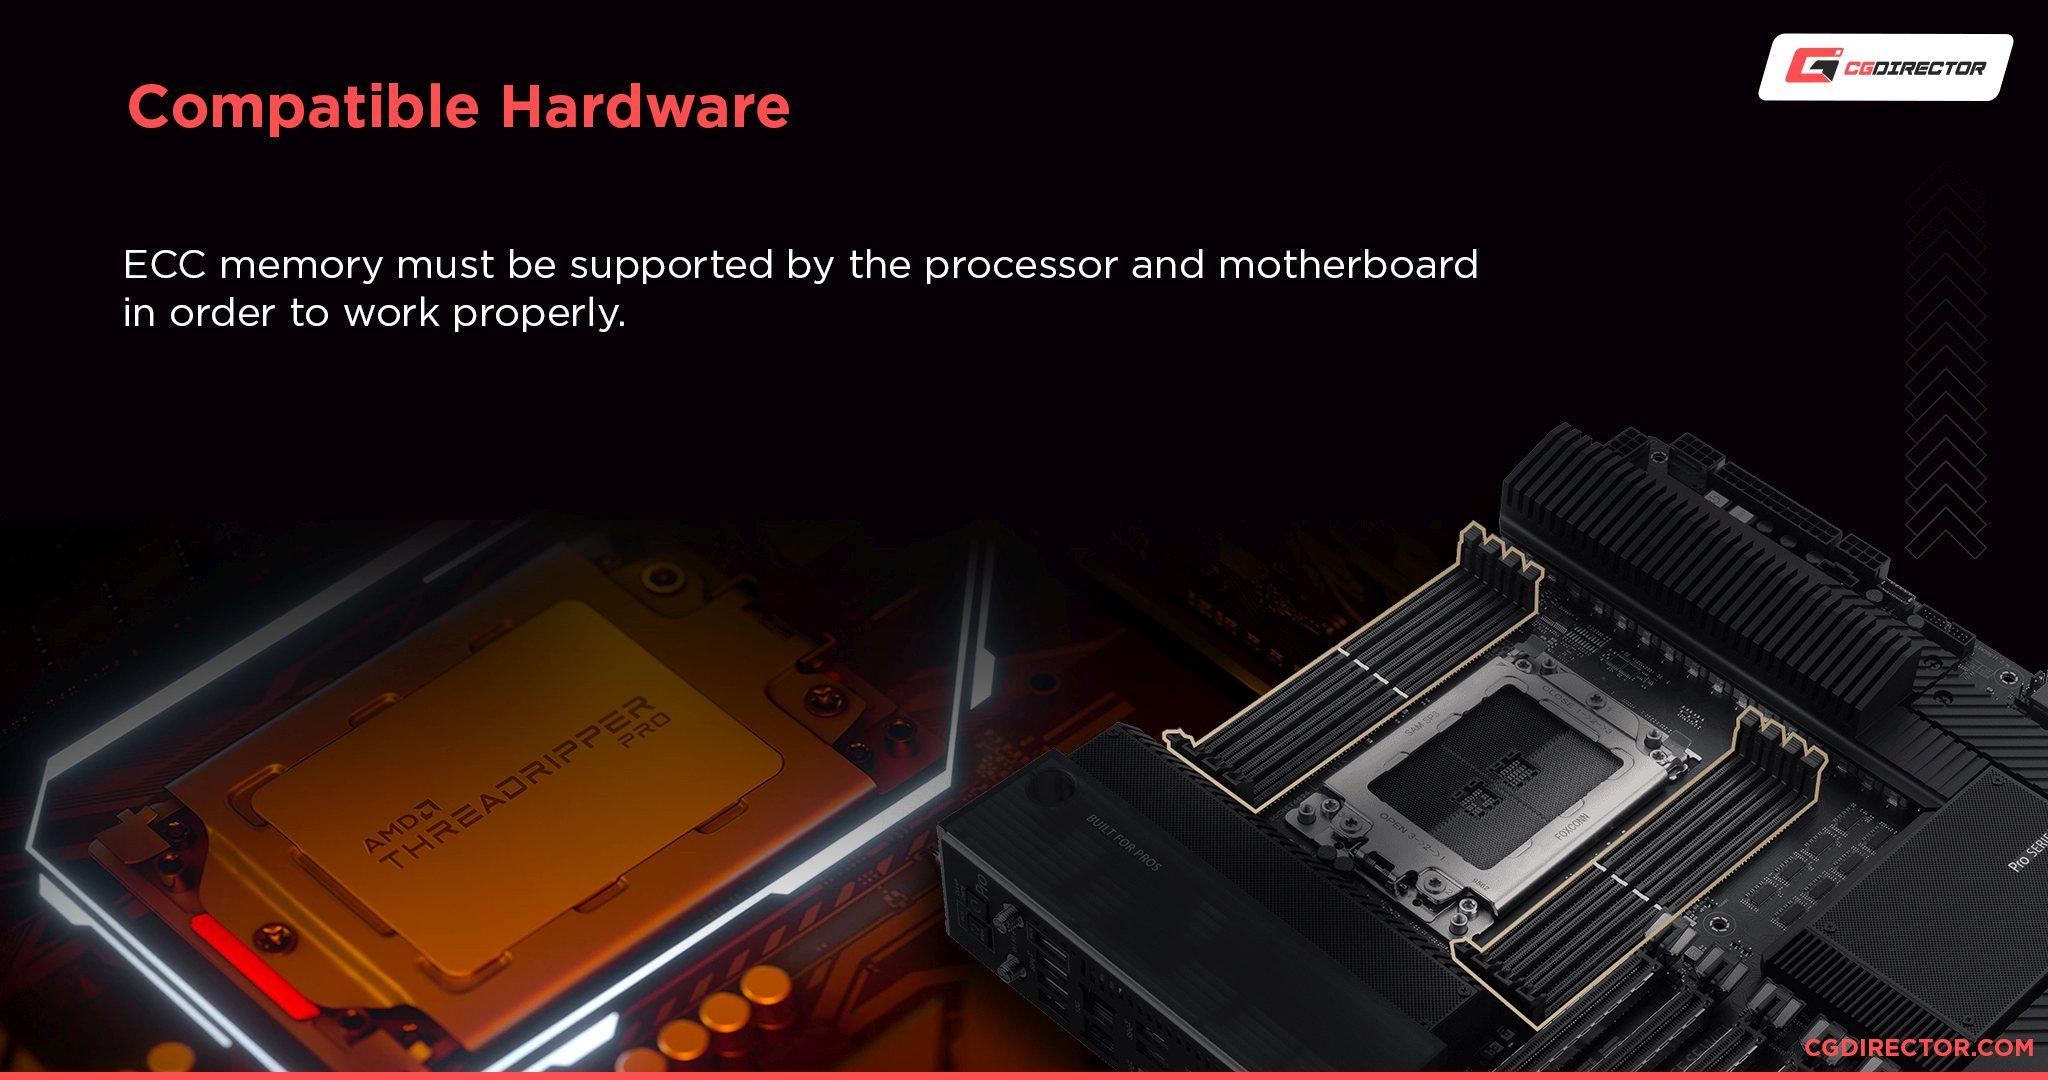 ECC Memory - Compatible Hardware